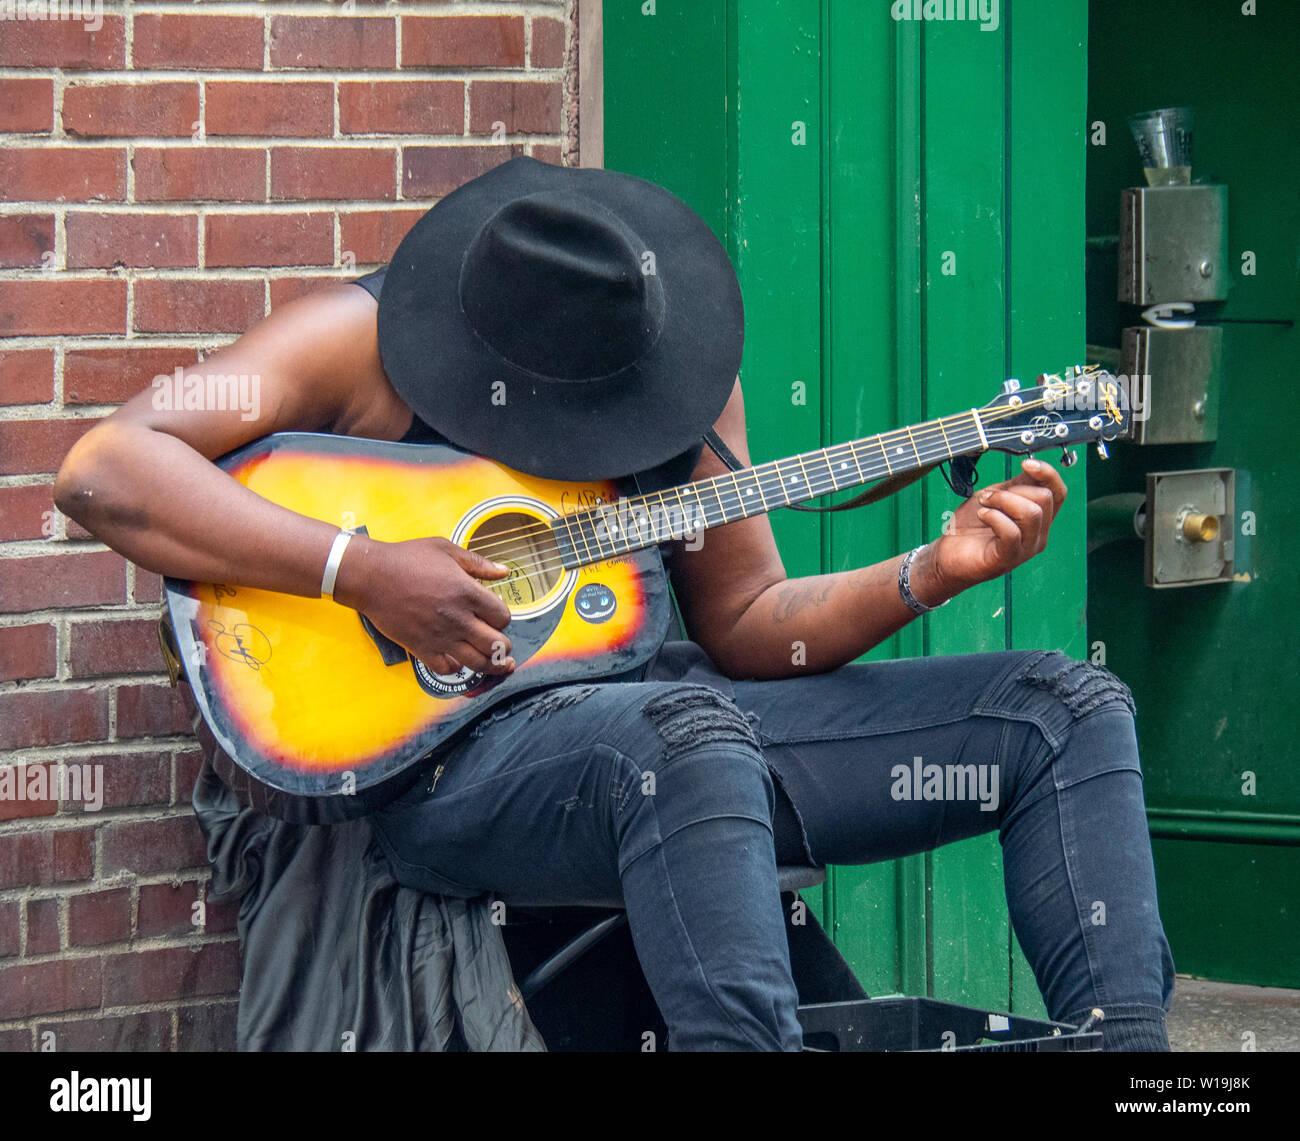 African American maschio chitarrista musicista di strada a Nashville Tennessee, USA. Foto Stock